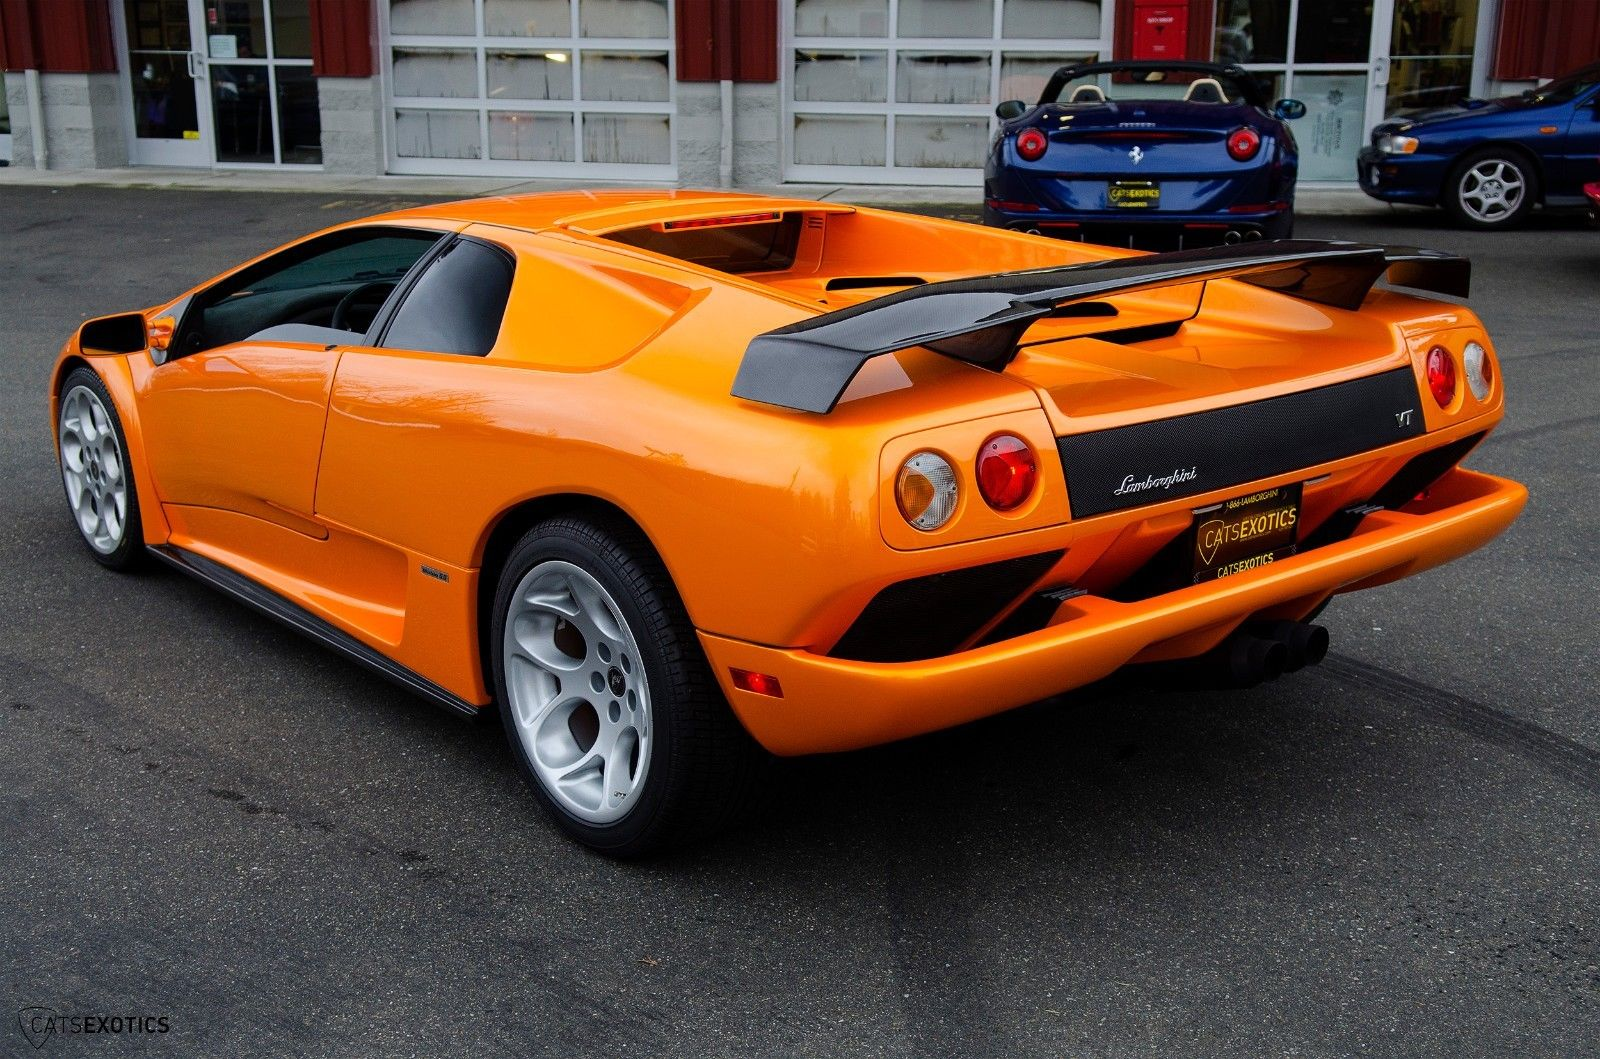 Awesome 2001 Lamborghini Diablo 6 0 Vt Rare Arancio Atlas Carbon Fiber Interior Sp Engineering Exhaust 2018 2019